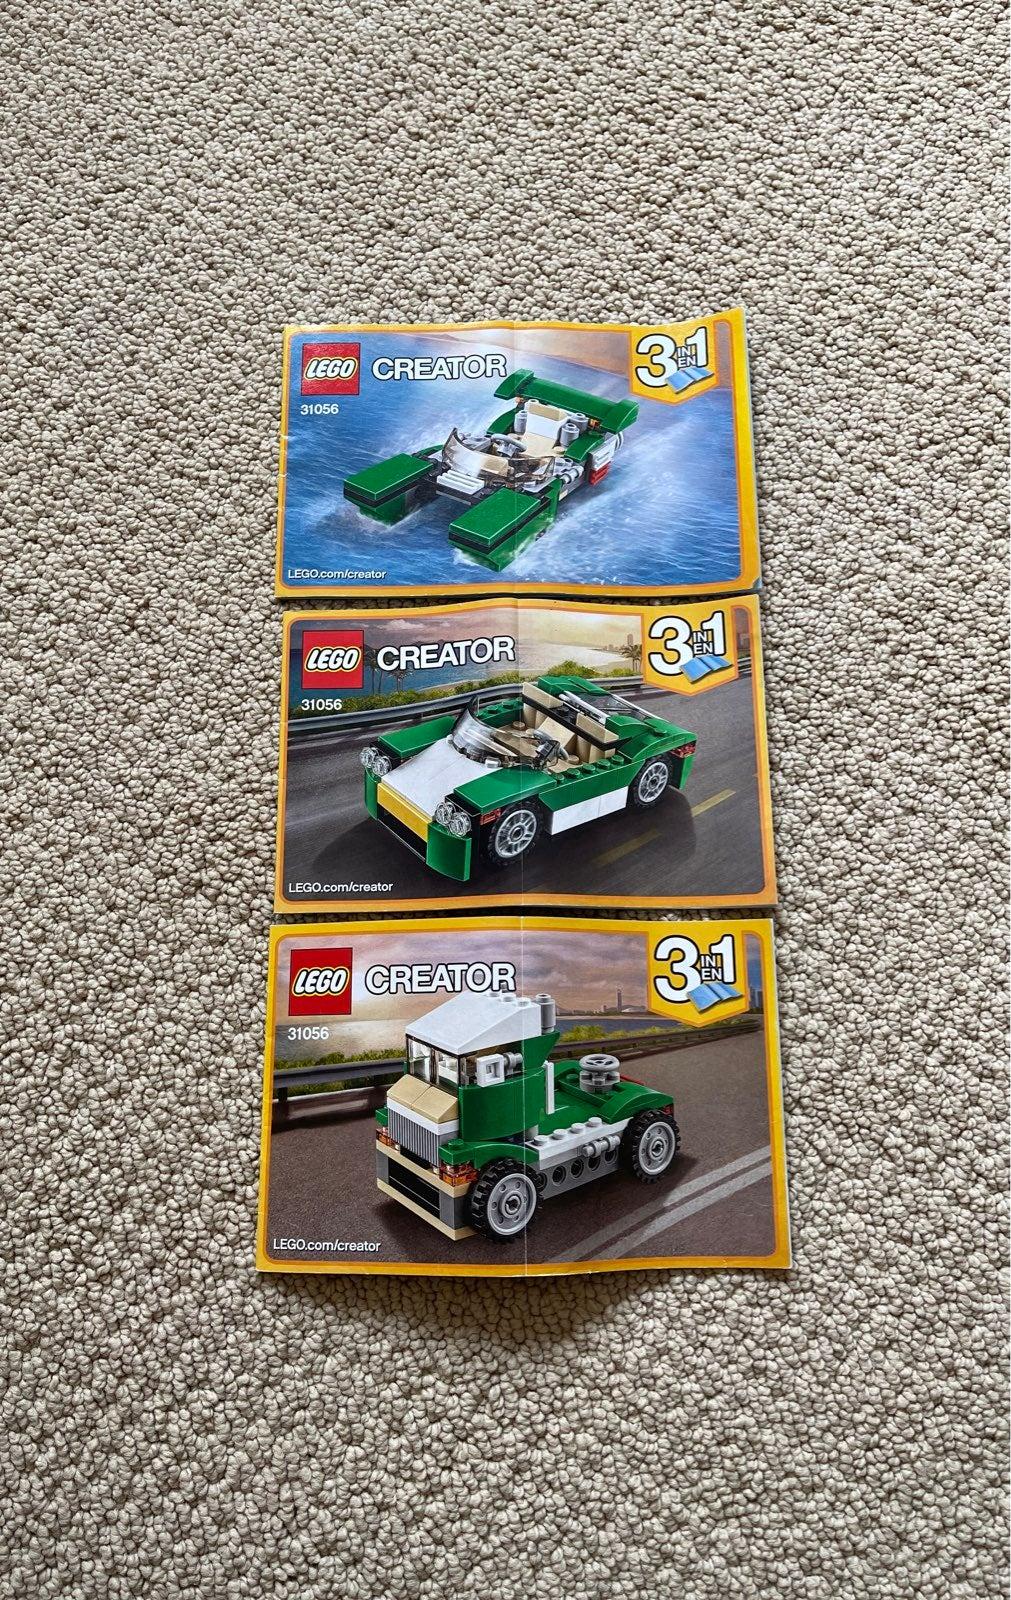 LEGO Creator 3-in-1: Green Cruiser